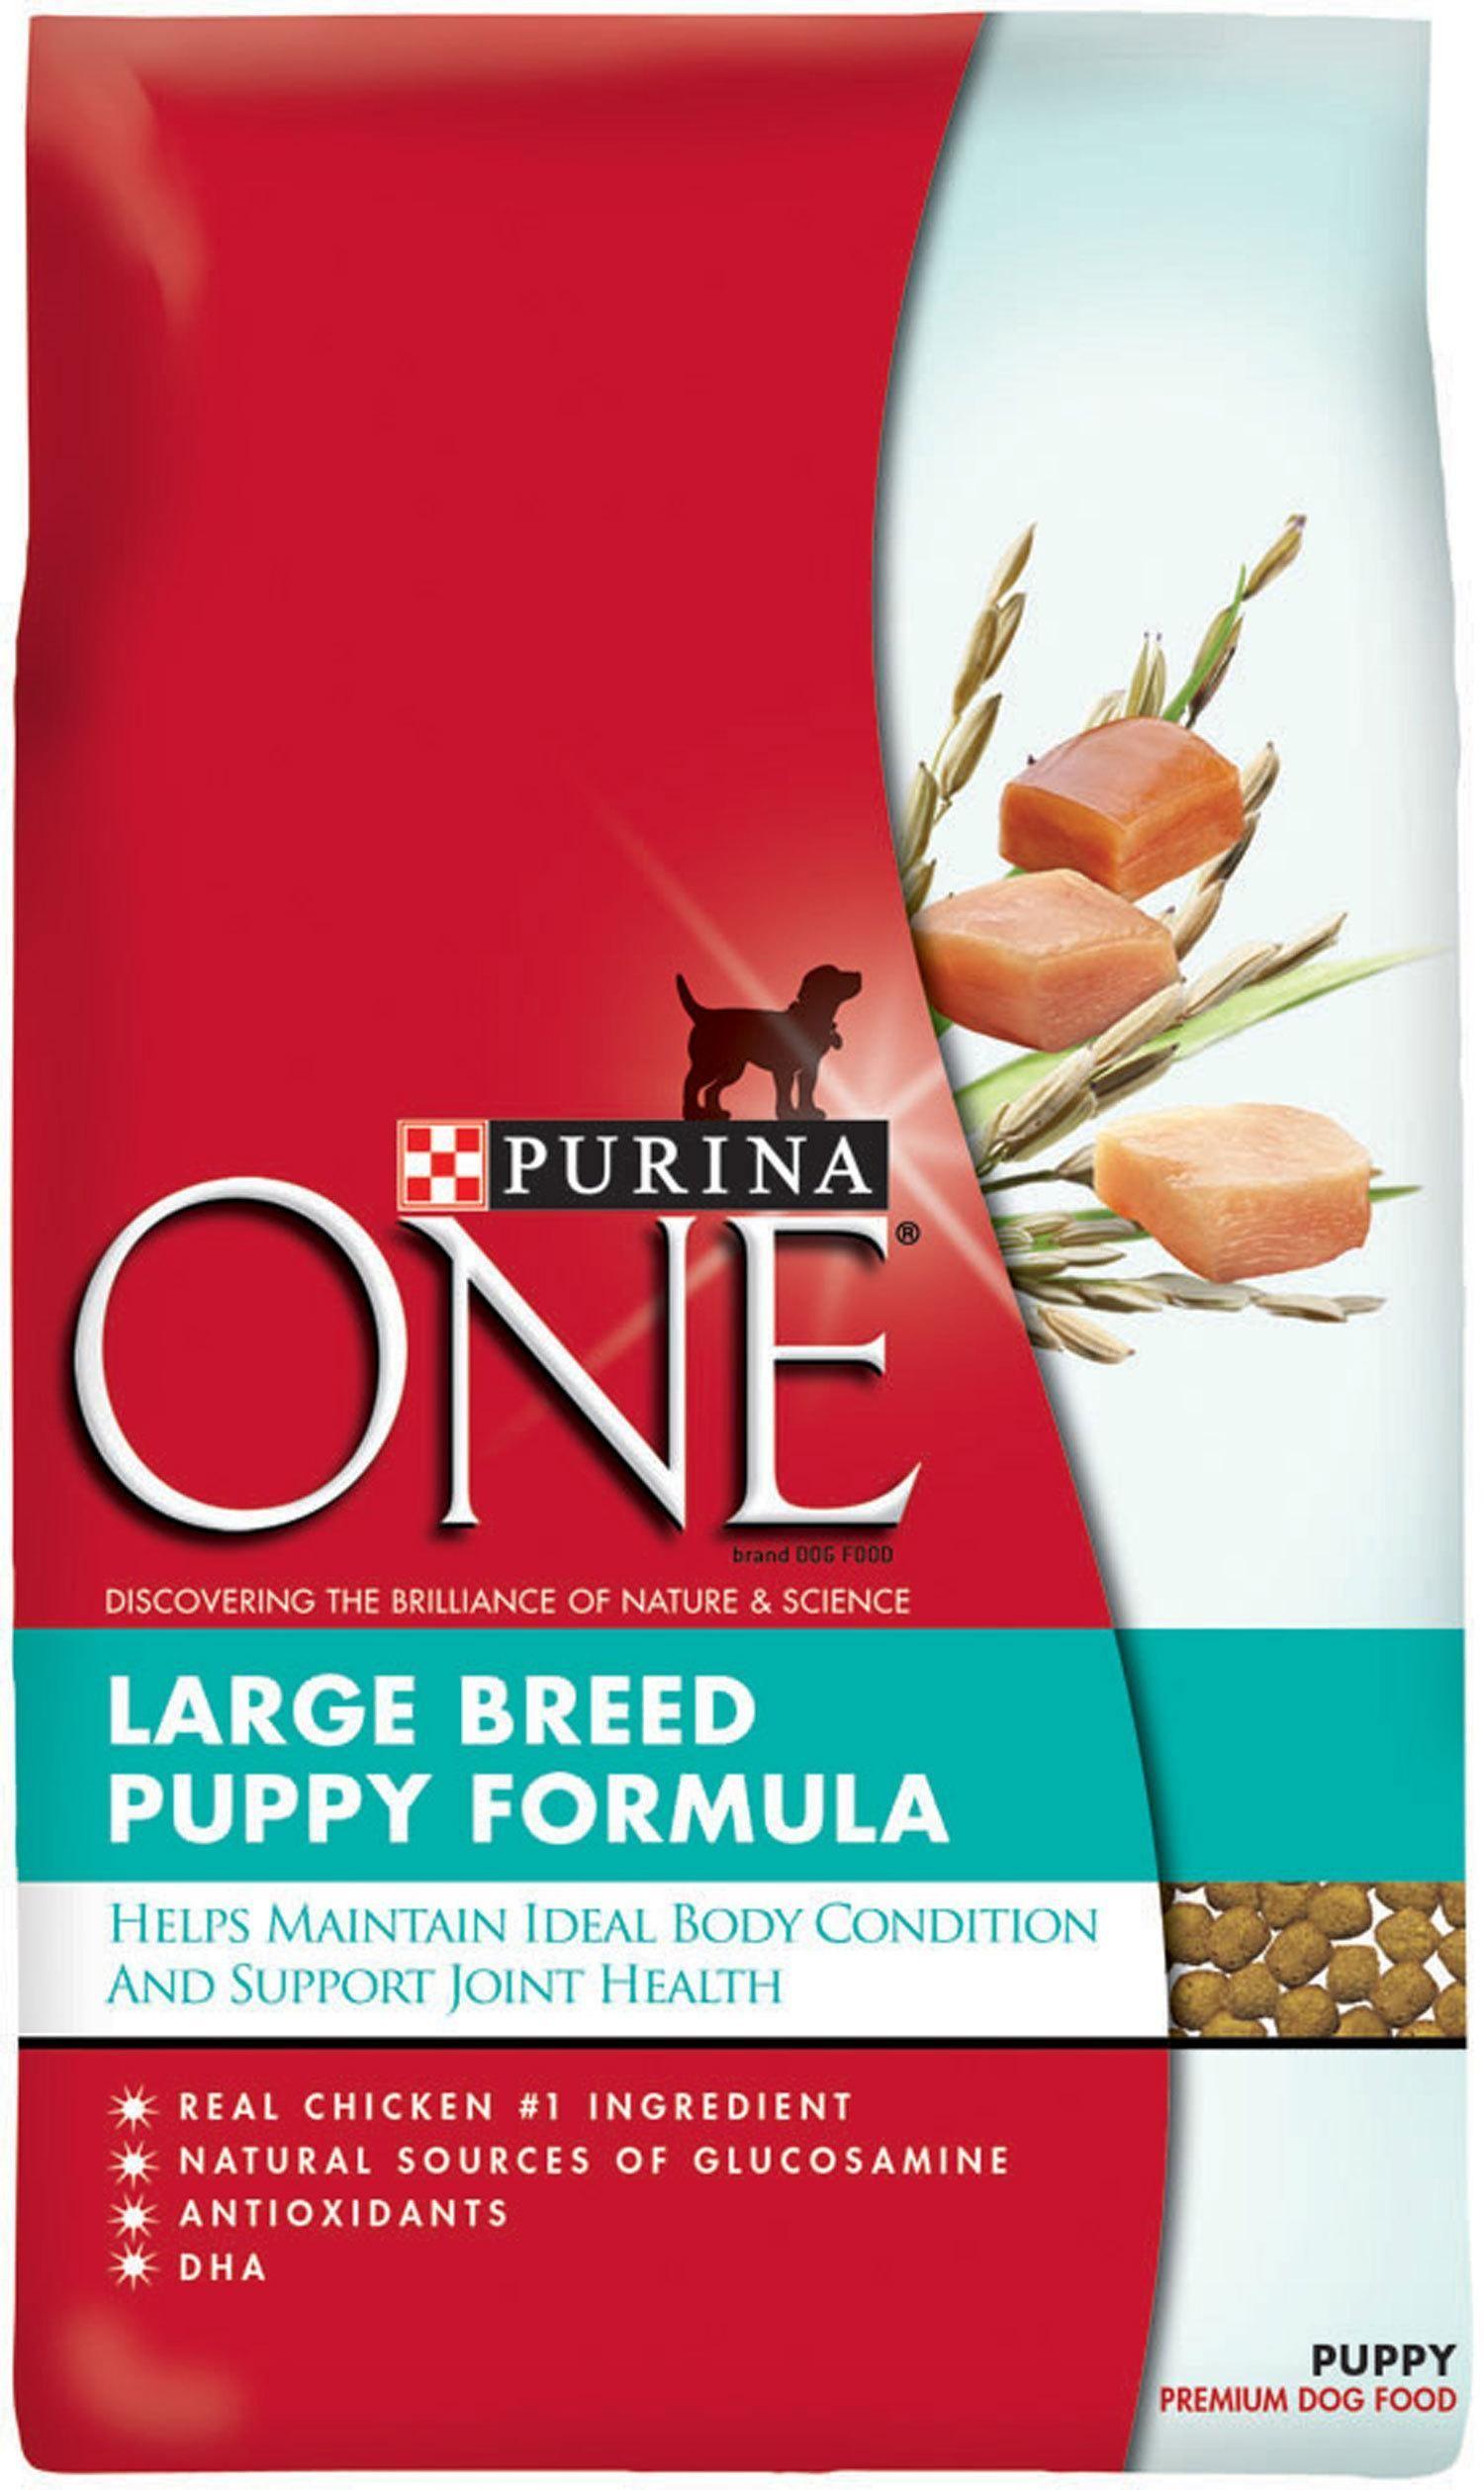 Purina ONE Large Breed Puppy Formula Dry Dog Food Dog